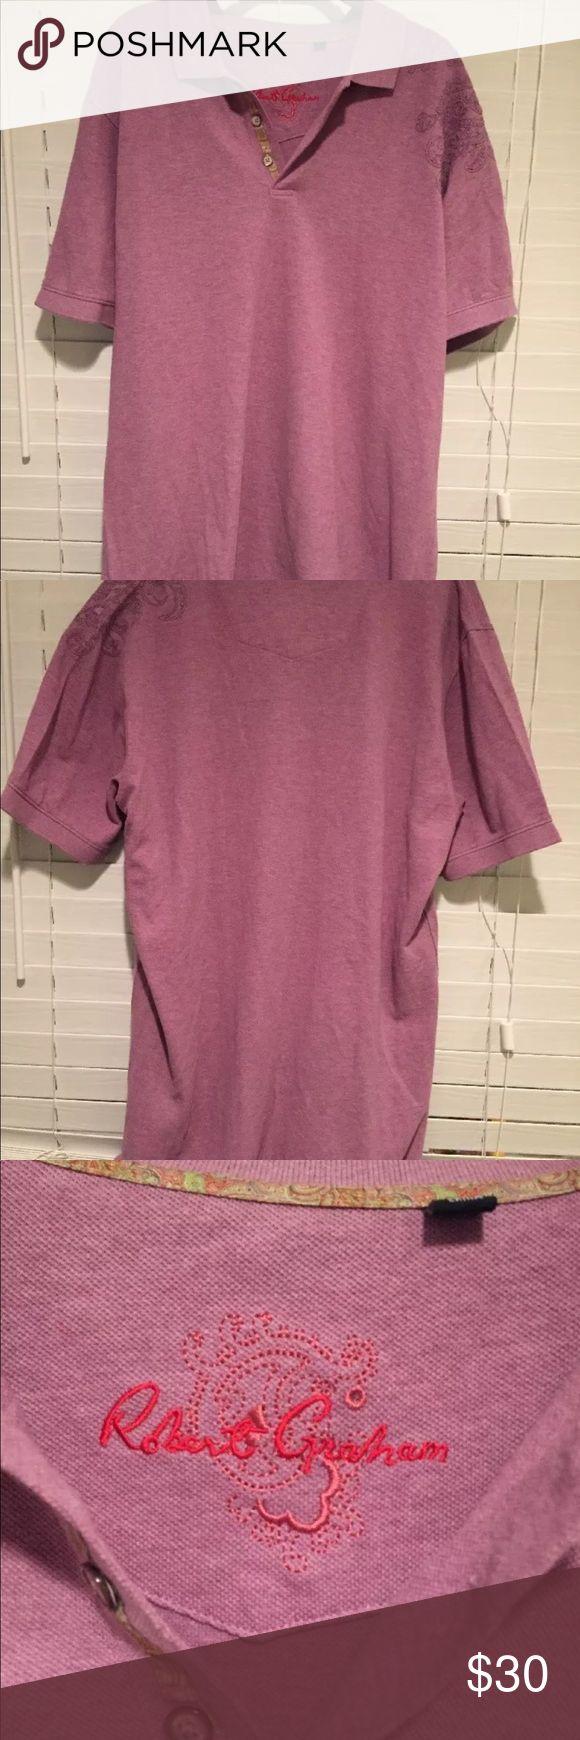 Robert Graham sz XL Purple Polo Shirt Embroidered Mens Robert Graham sz XL Purple Polo Shirt Embroidered Short Sleeve Robert Graham Shirts Polos